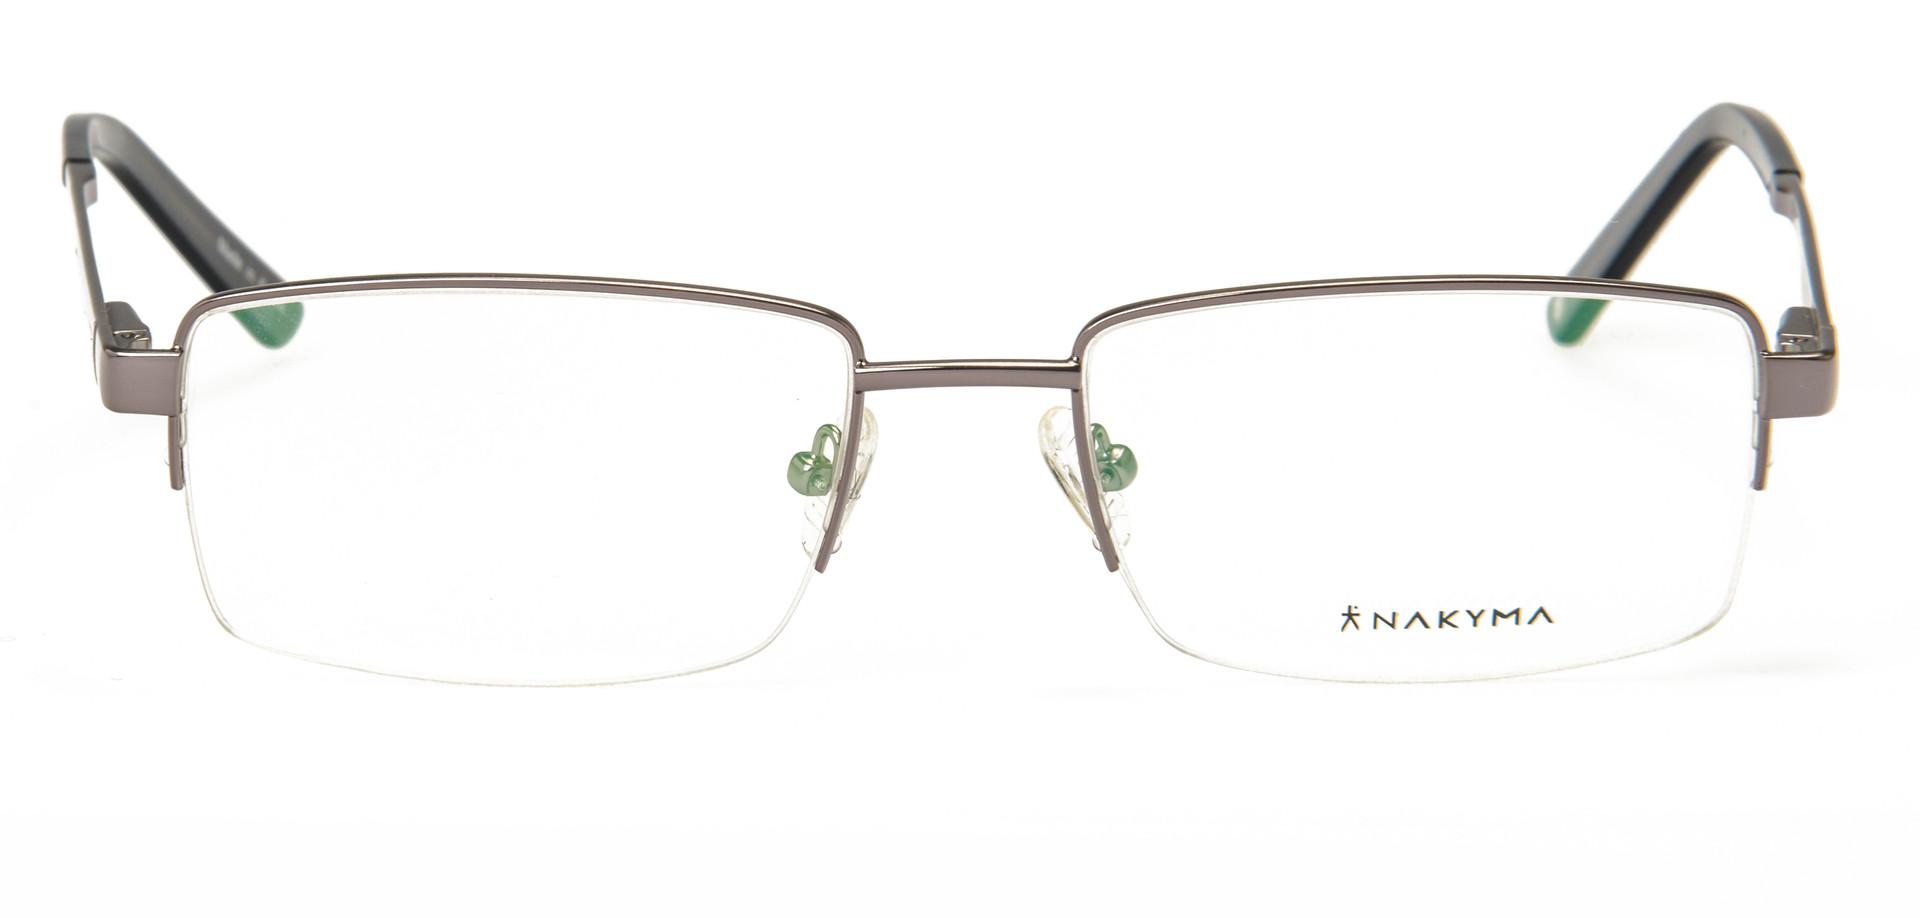 7R1-NAKYMA-08-C1